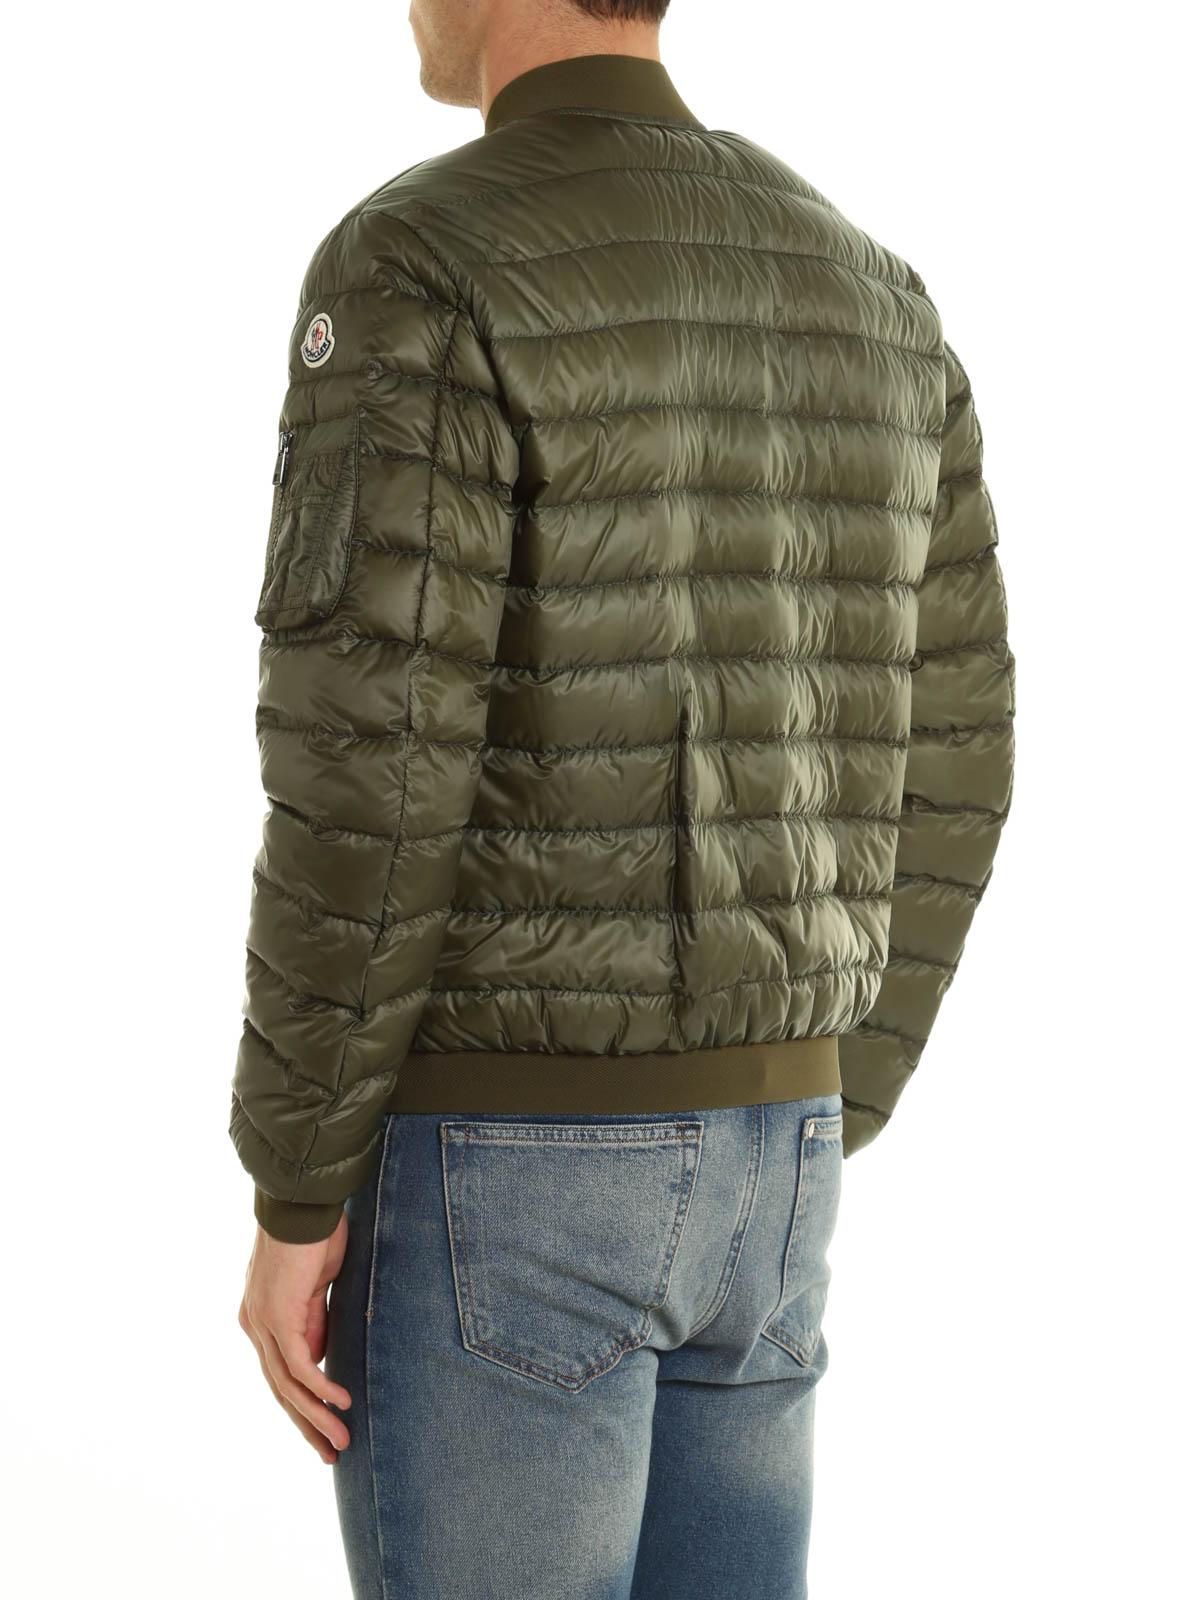 a8b875eab Moncler - Aidan lightweight bomber jacket - padded jackets - C1 091 ...